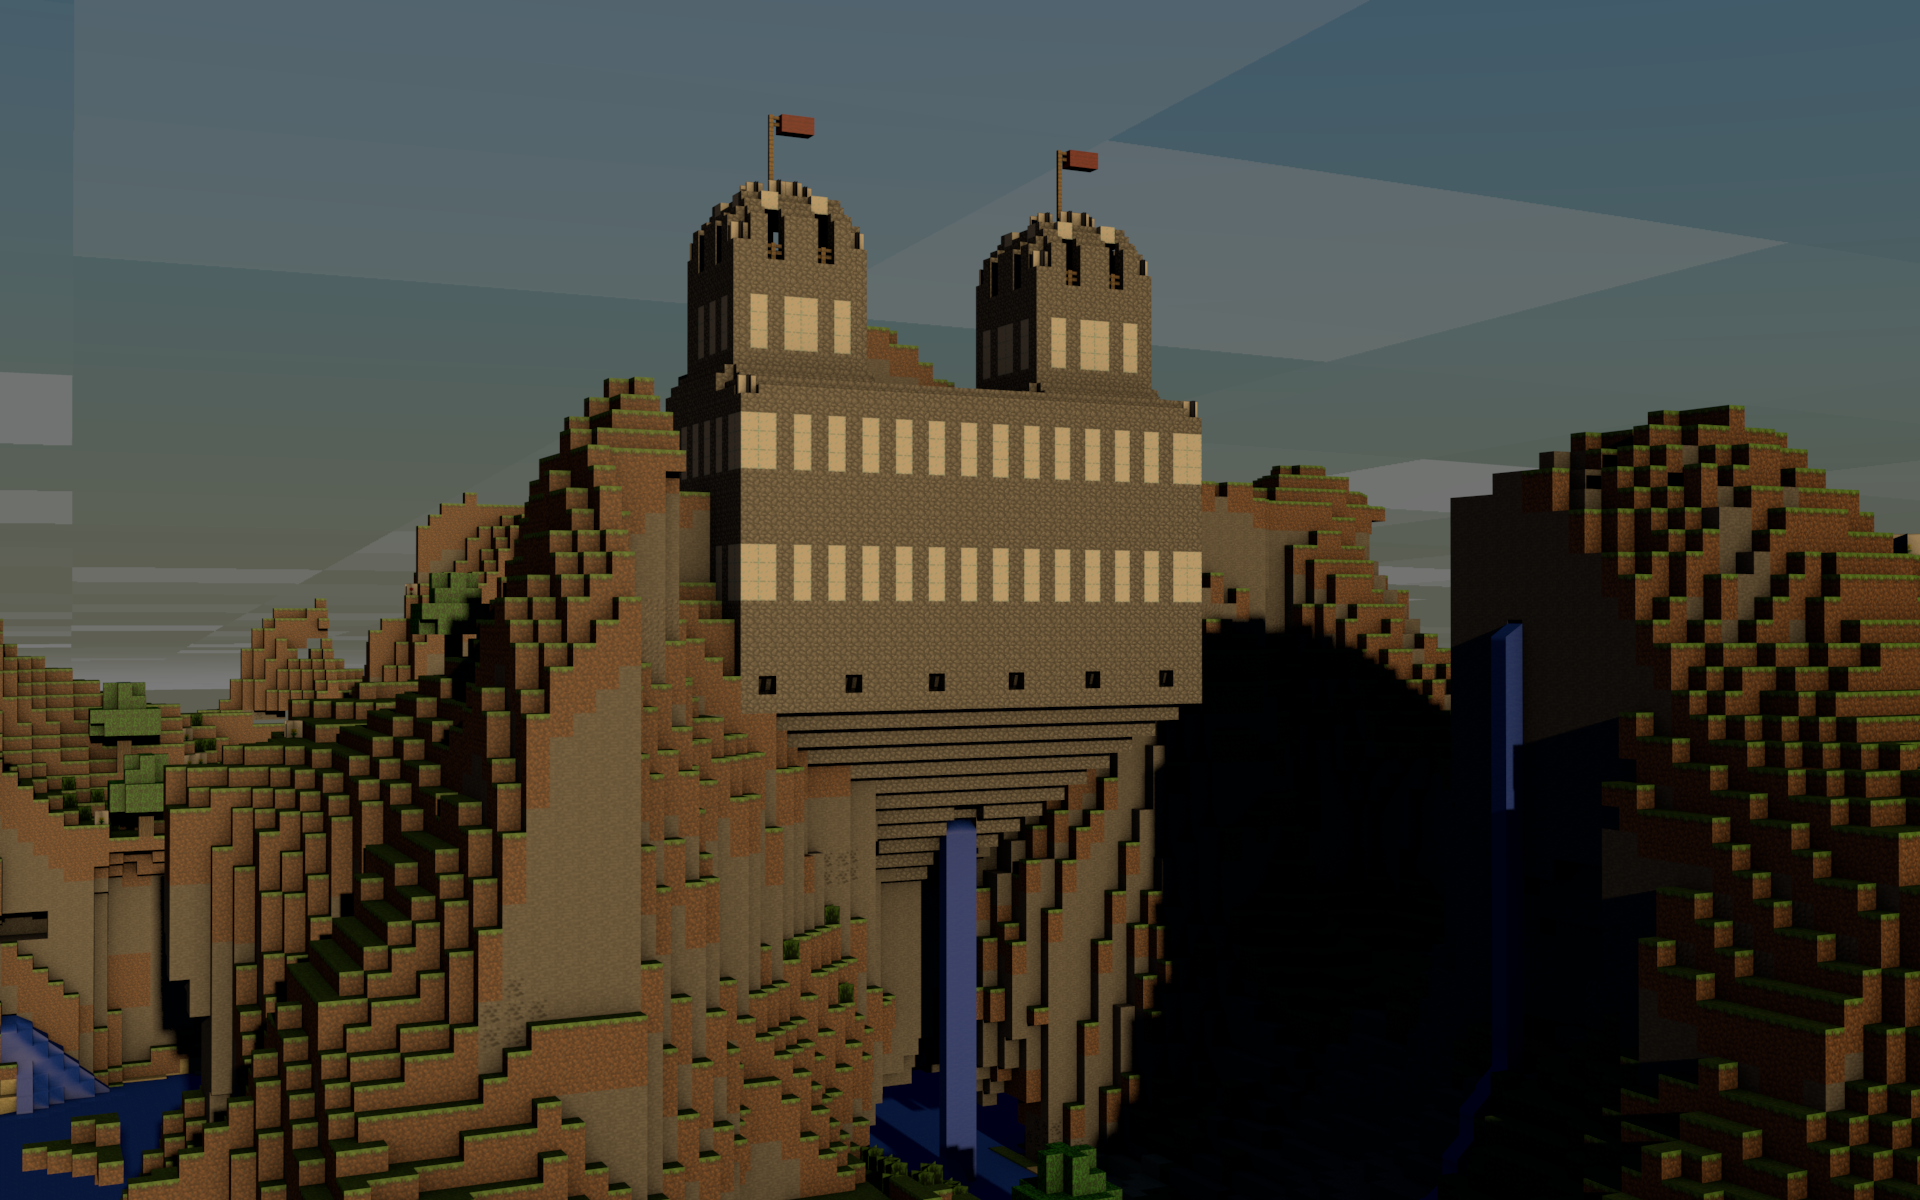 Minecraft Castle 3d render by MHalse on DeviantArt